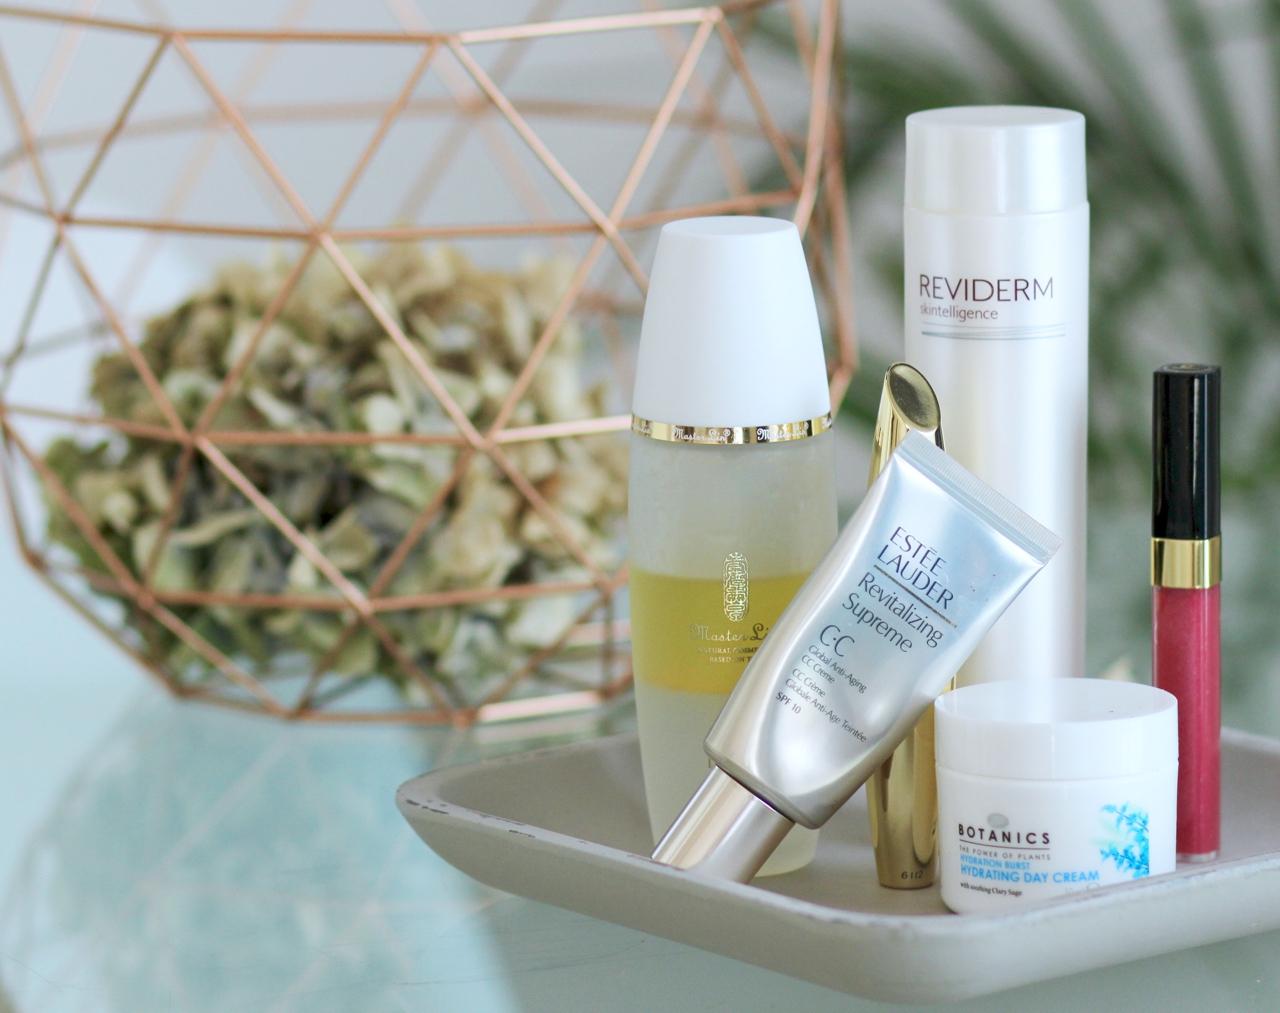 10 Beauty Favoriten im September Kosmetik Cosmetics Master Lin MAXFACTOR Mascara Chanel Lipgloss Estée Lauder BiRetix Botanics Reviderm Skin Skincare Hautpflege Batiste